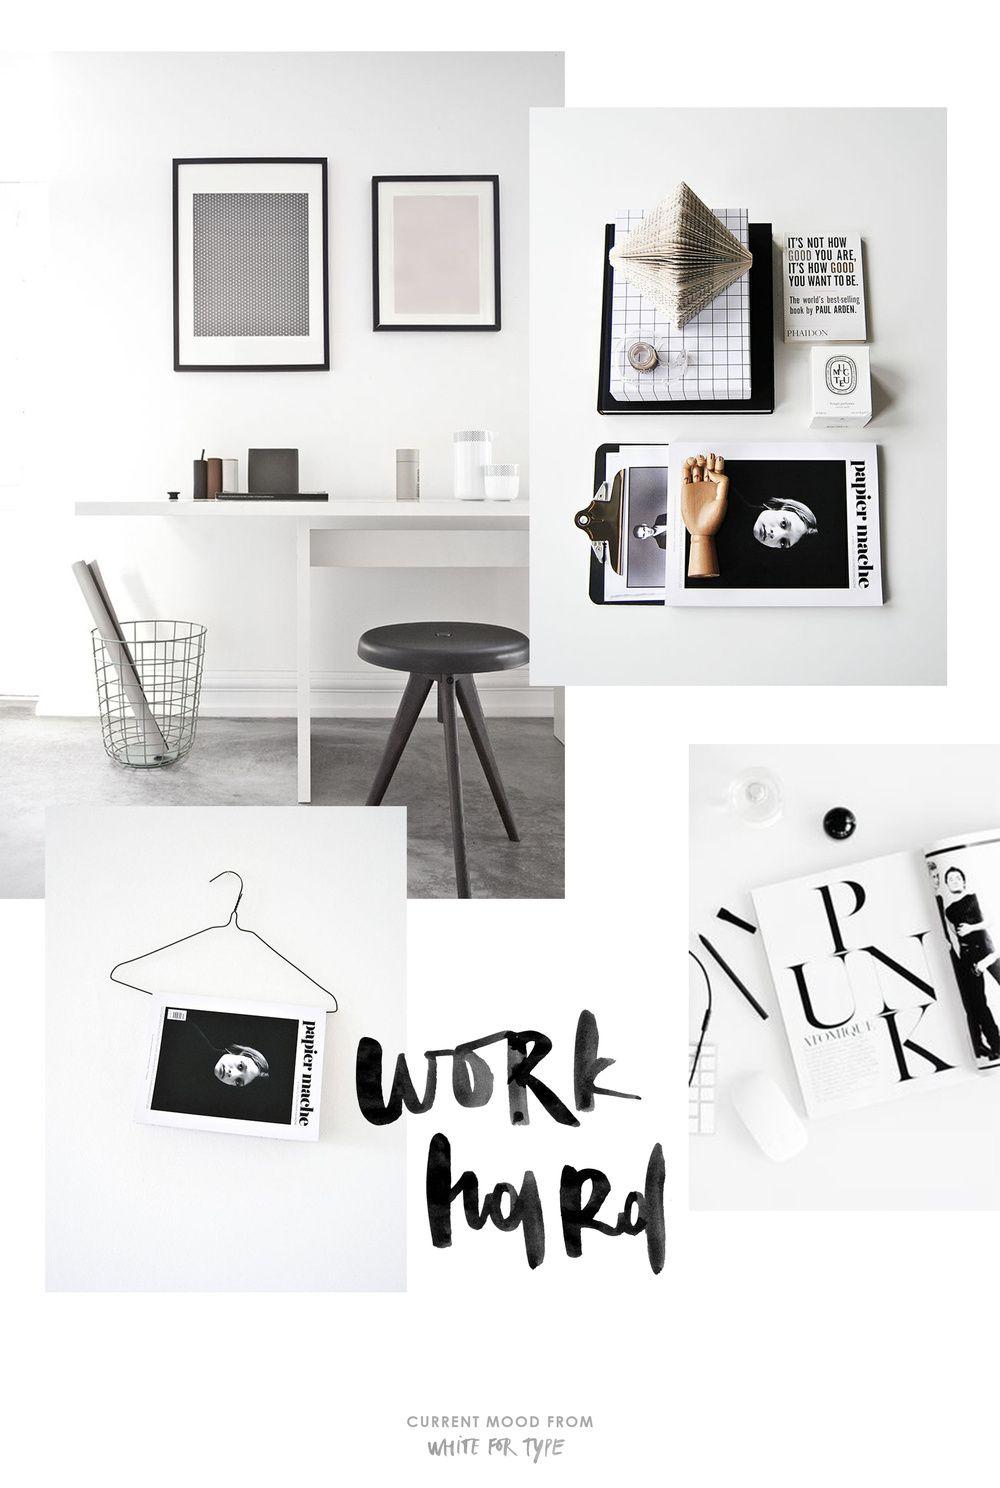 CURRENT MOOD: WORK HARD